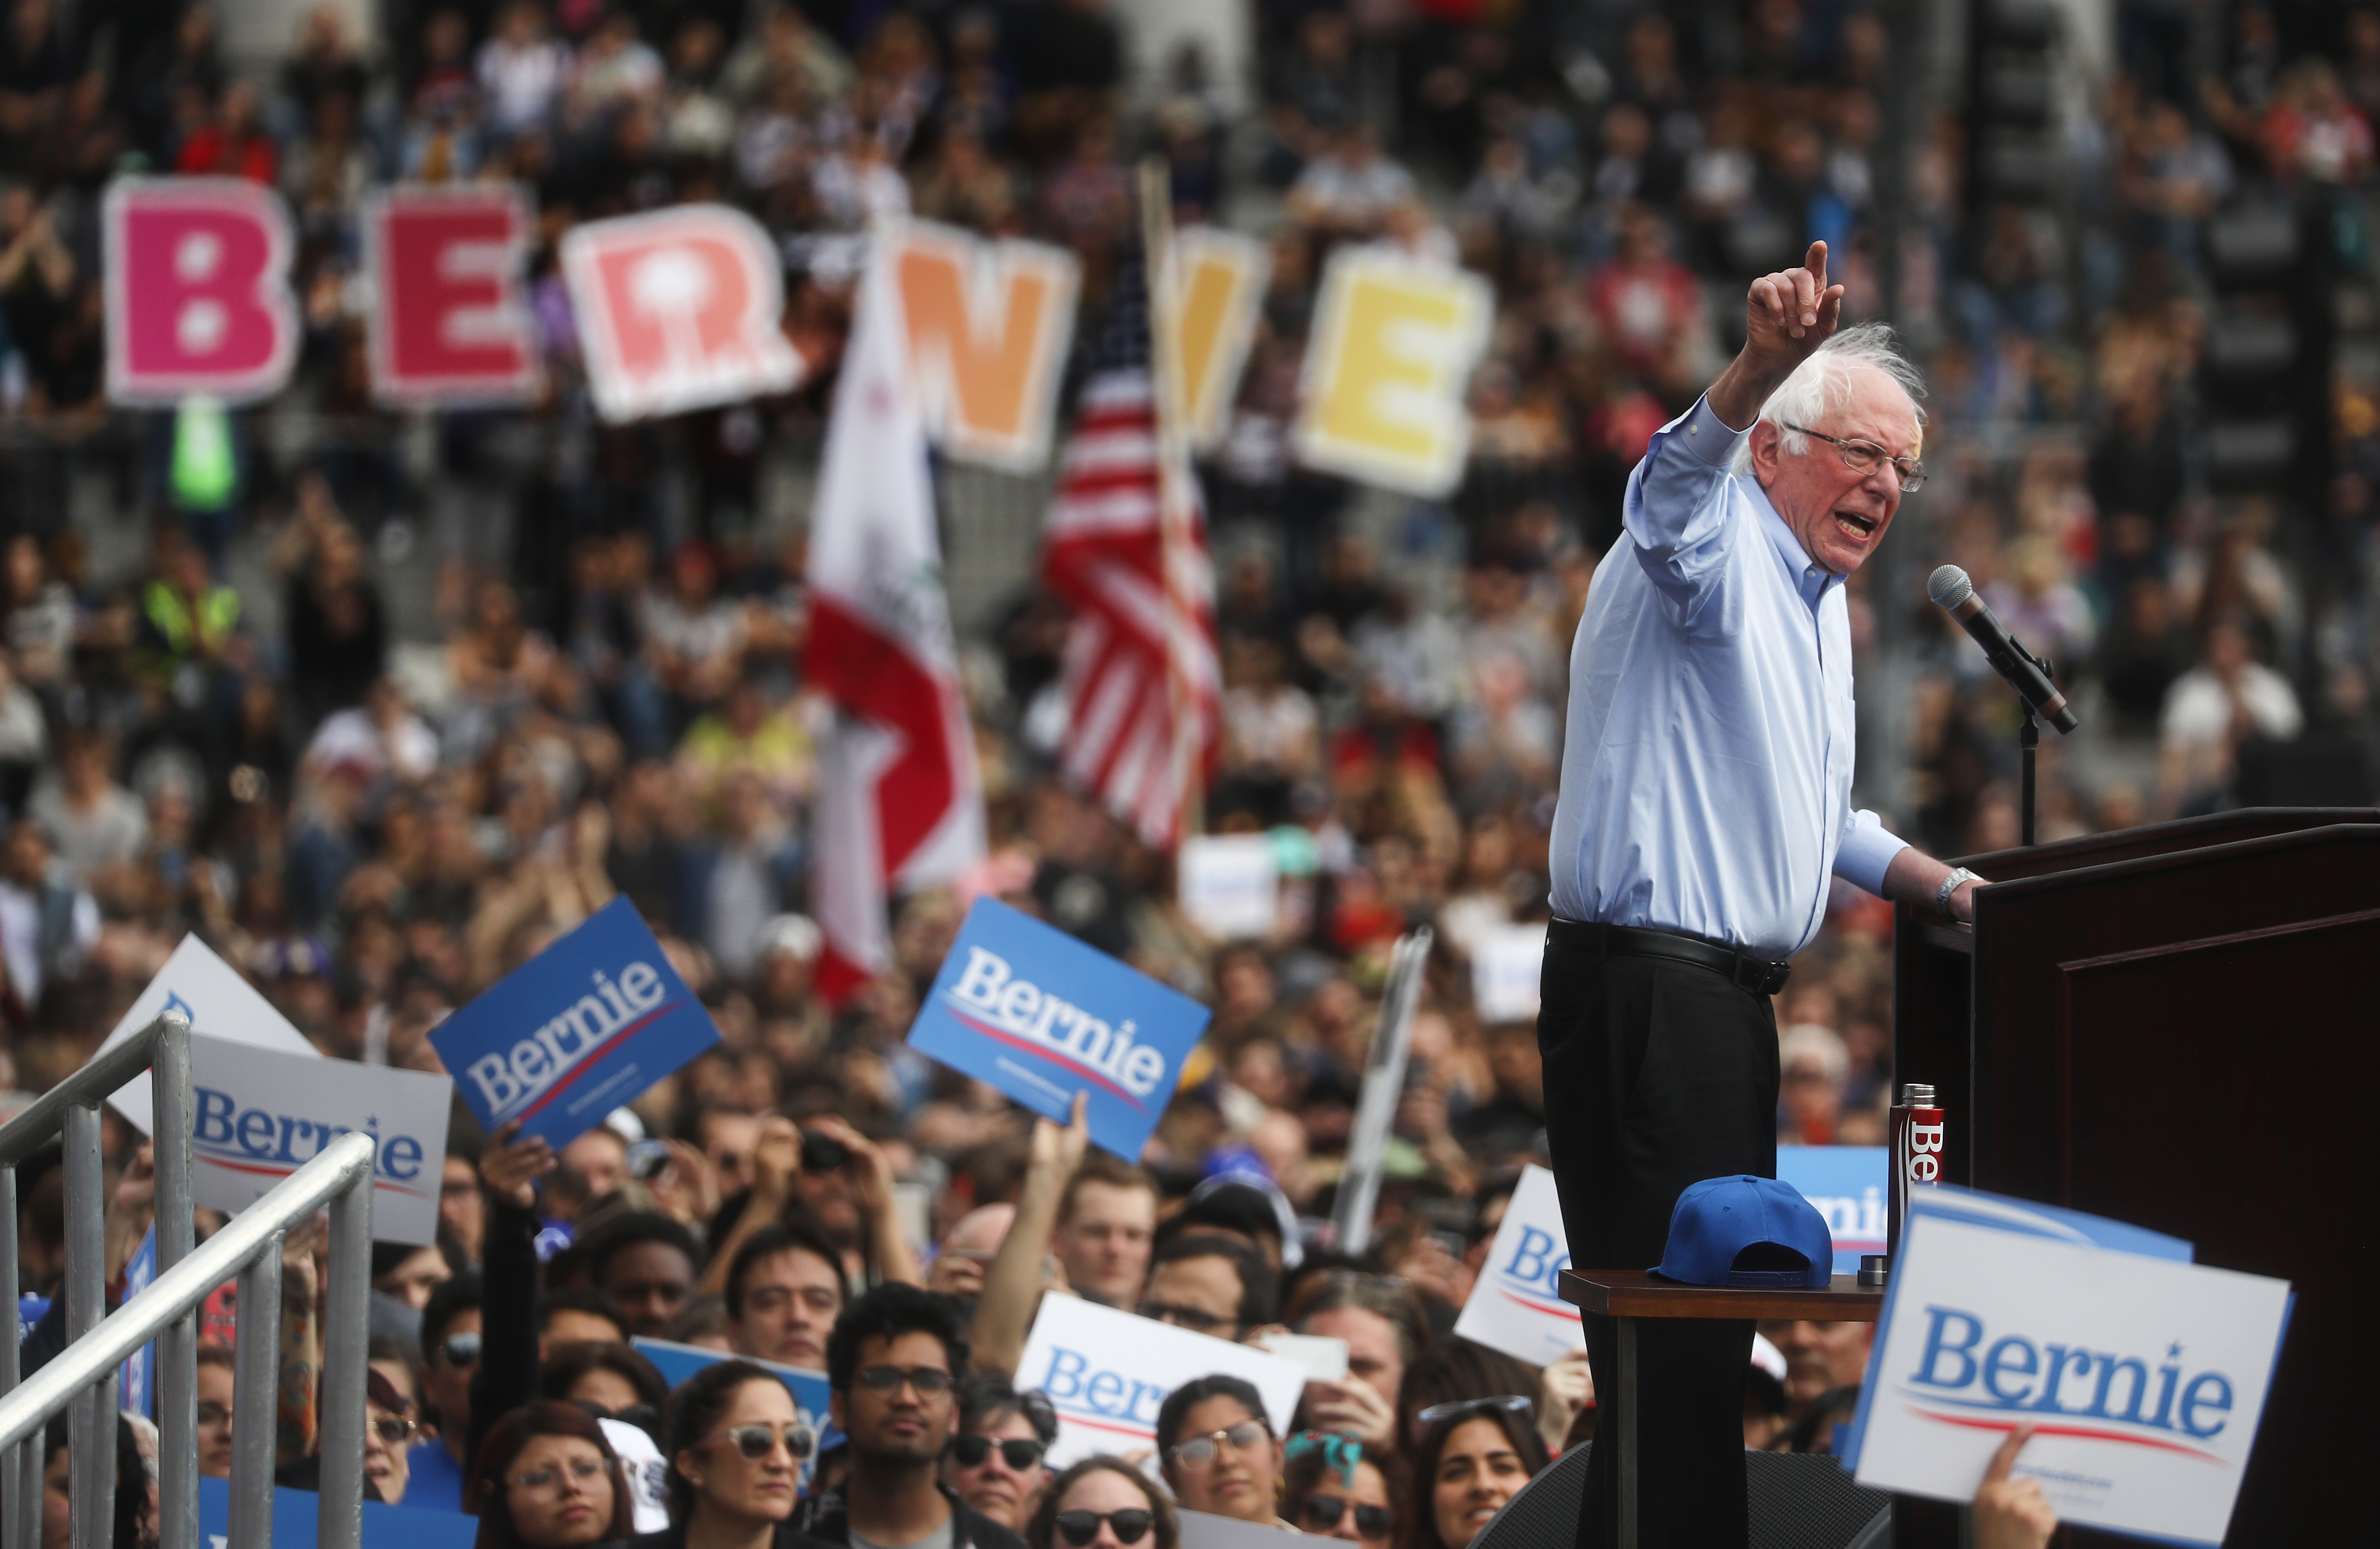 Bernie Sanders at a rally in 2019.